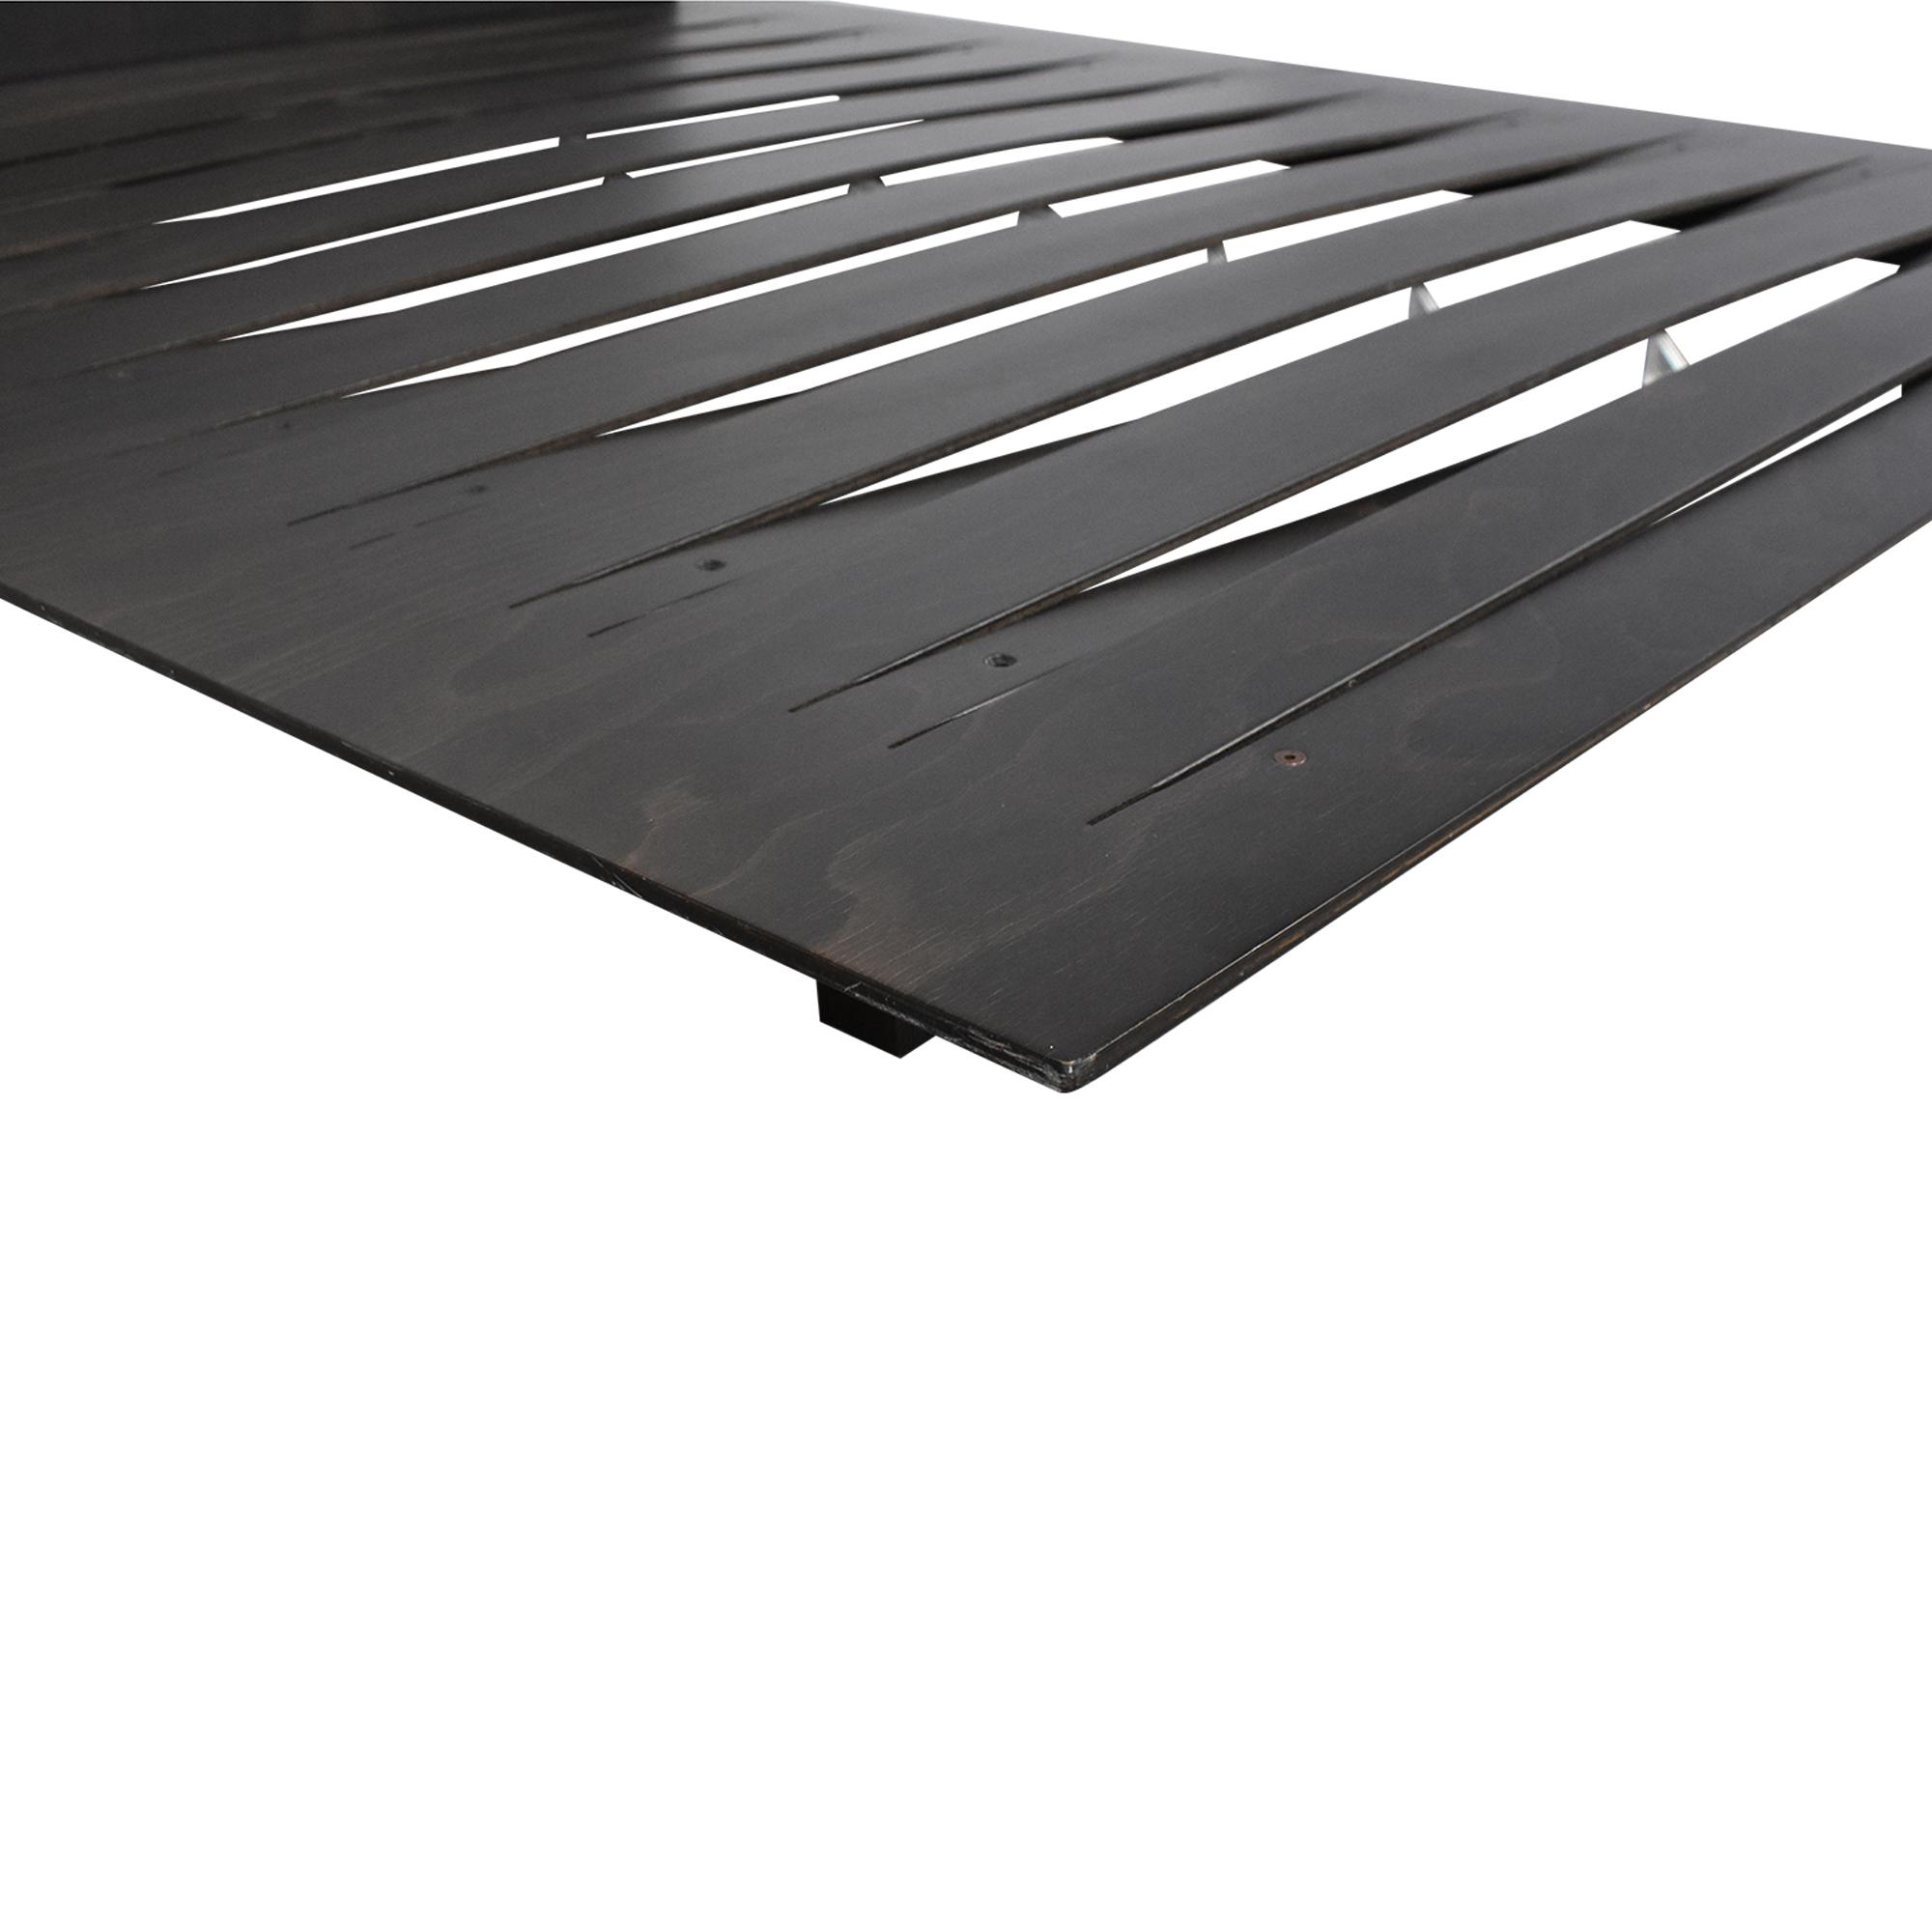 Horm Horm Sottiletto Full/Queen Mid-Century Platform Bed on sale